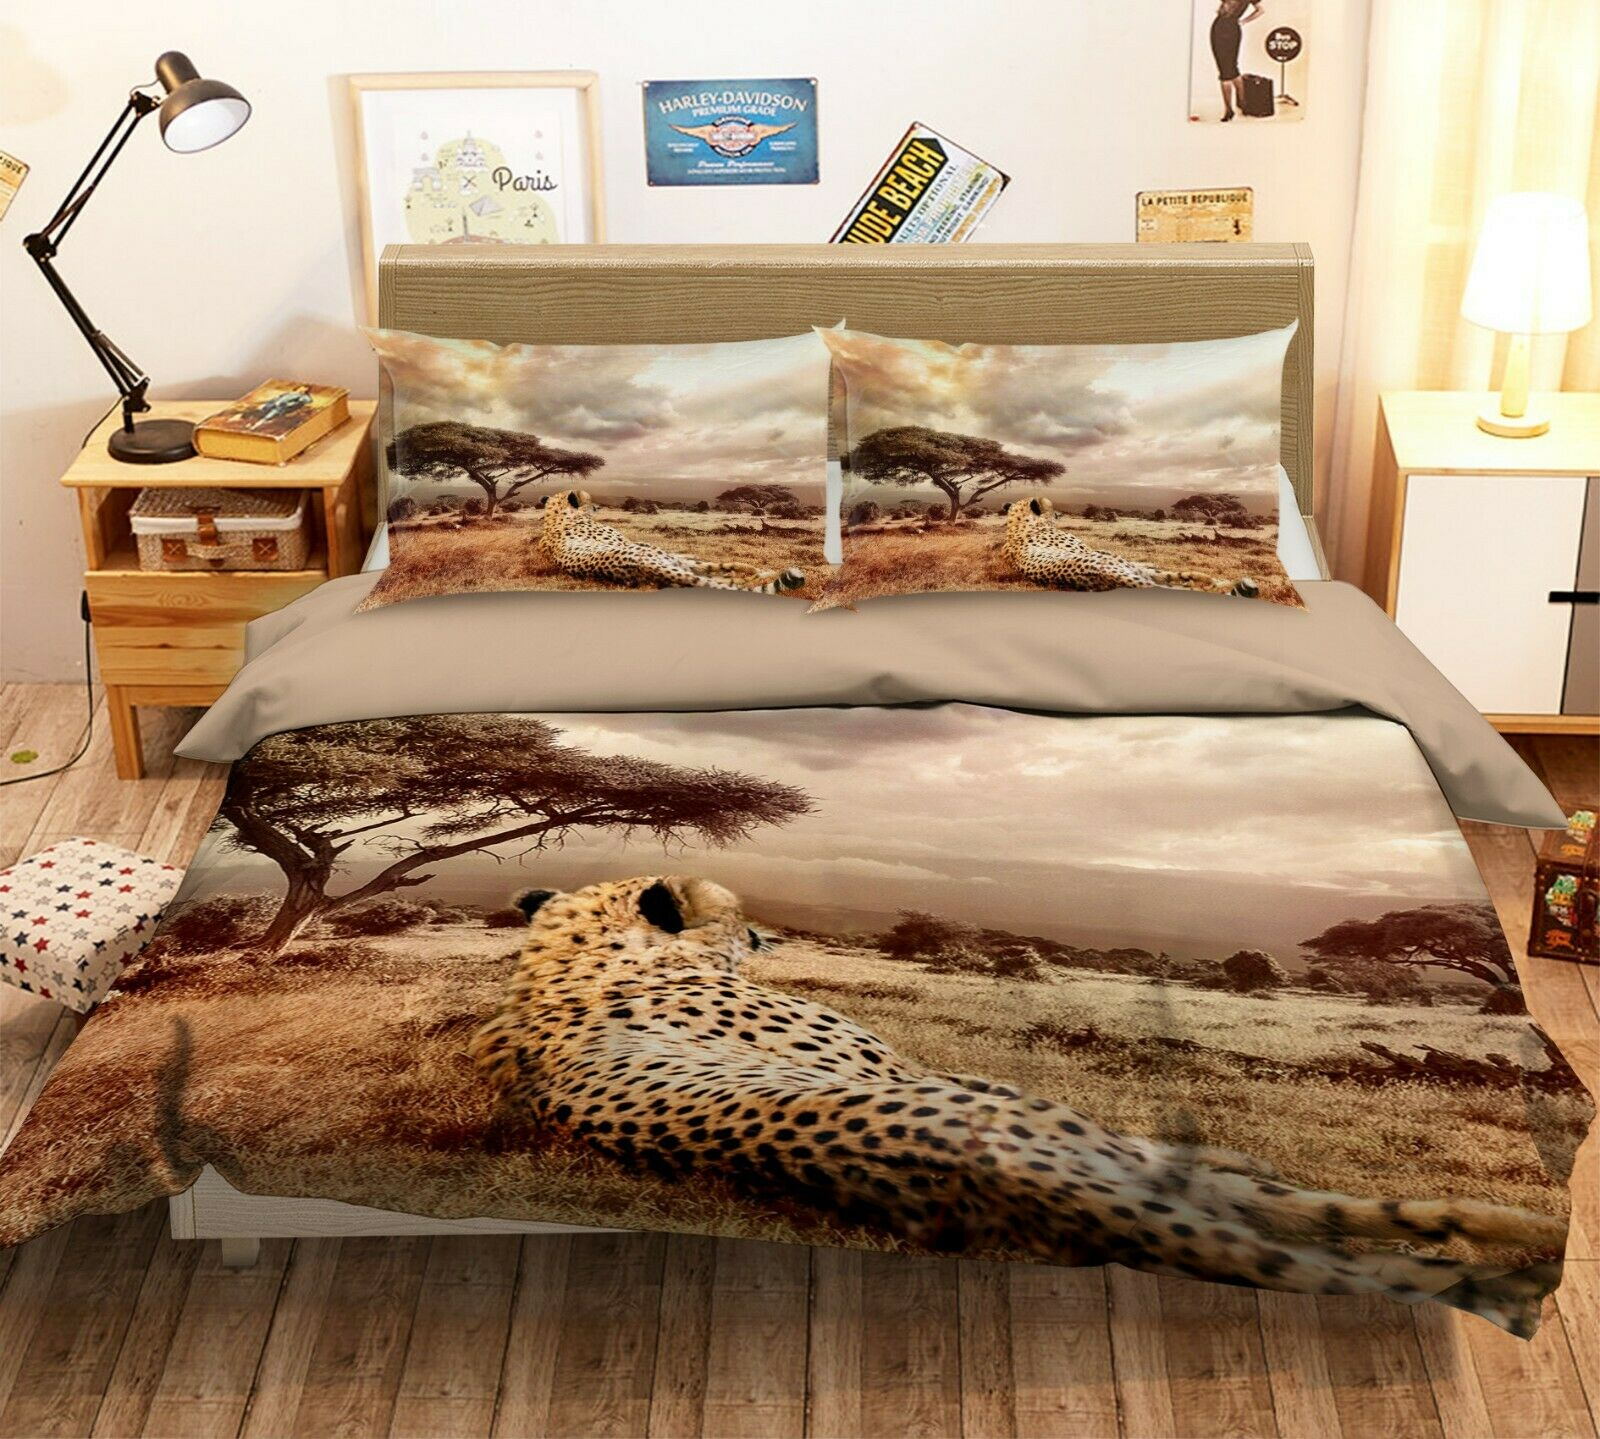 3D Leopard N26 Animal Bett Pillowcases Quilt Duvet Startseite Königin König Amy